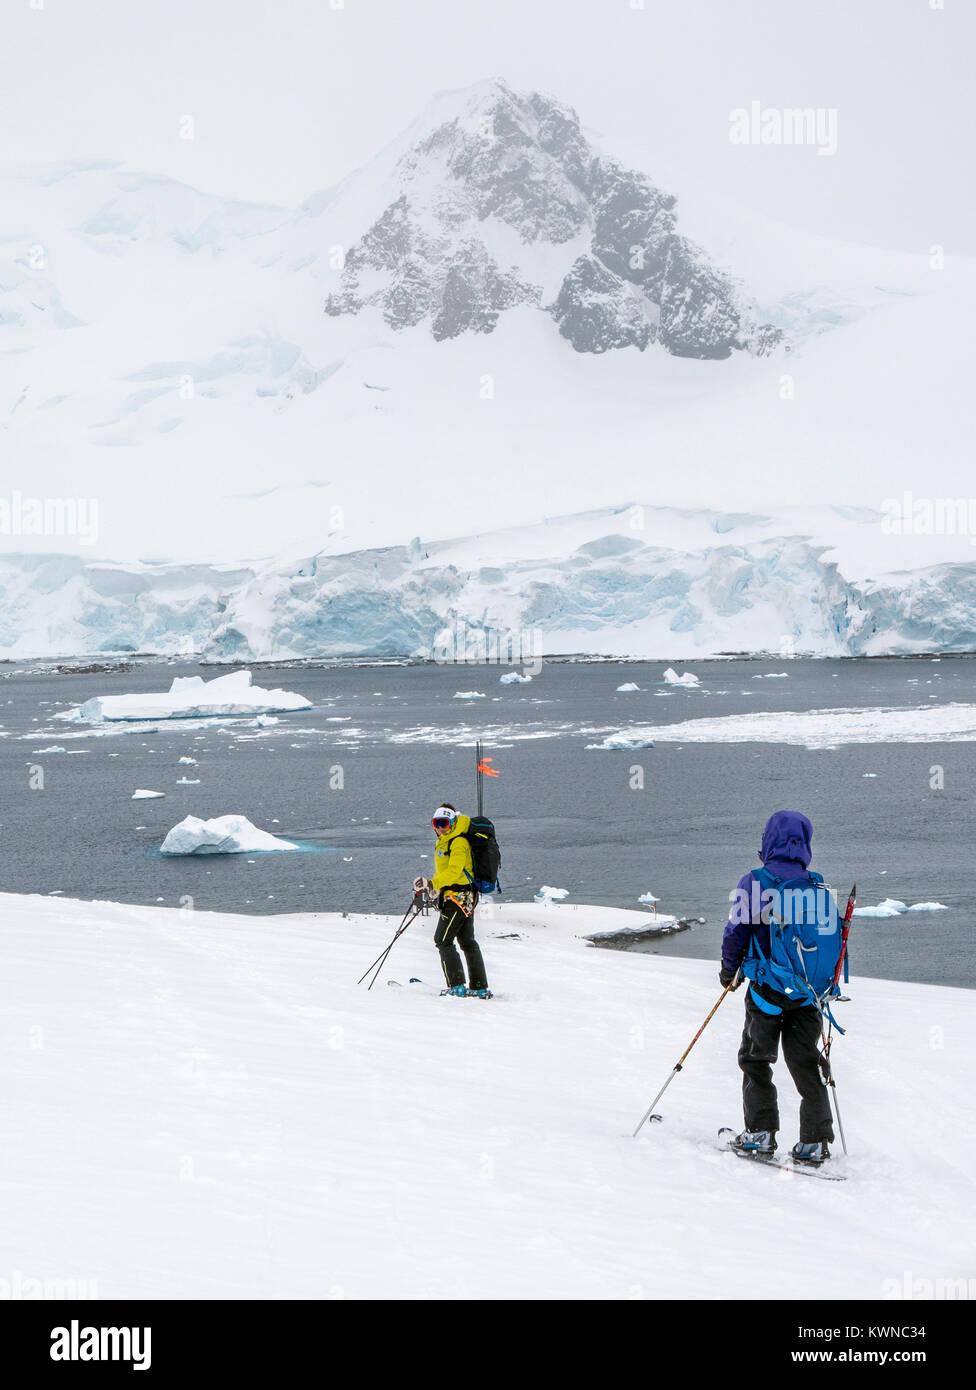 Alpine ski mountaineers skiing downhill in Antarctica - Stock Image